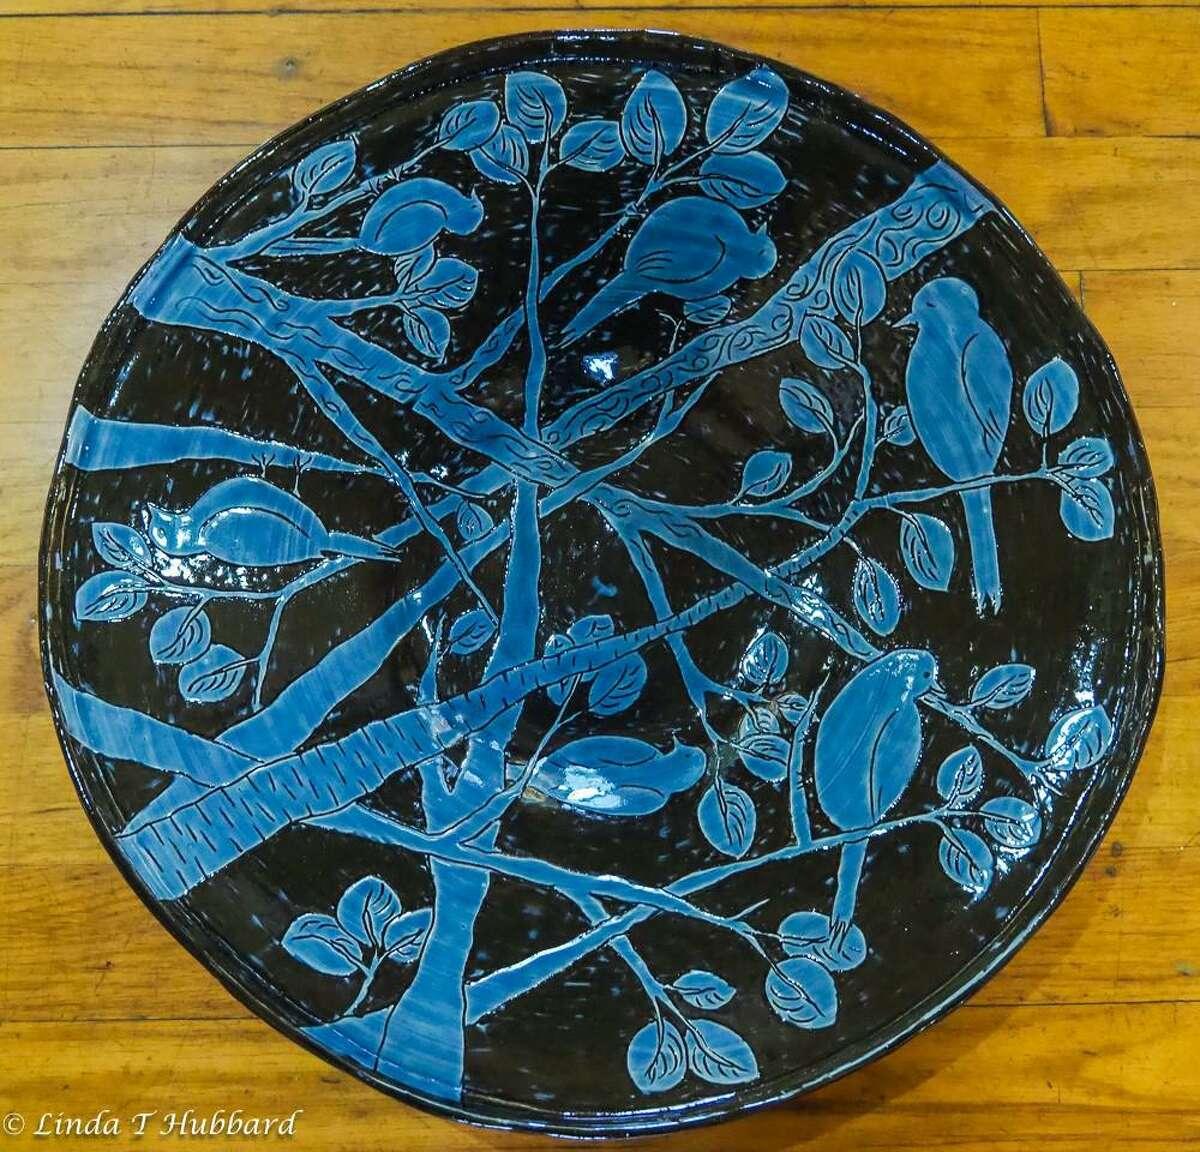 Blue Bird Bowl, pottery by Roberta Ahuja.